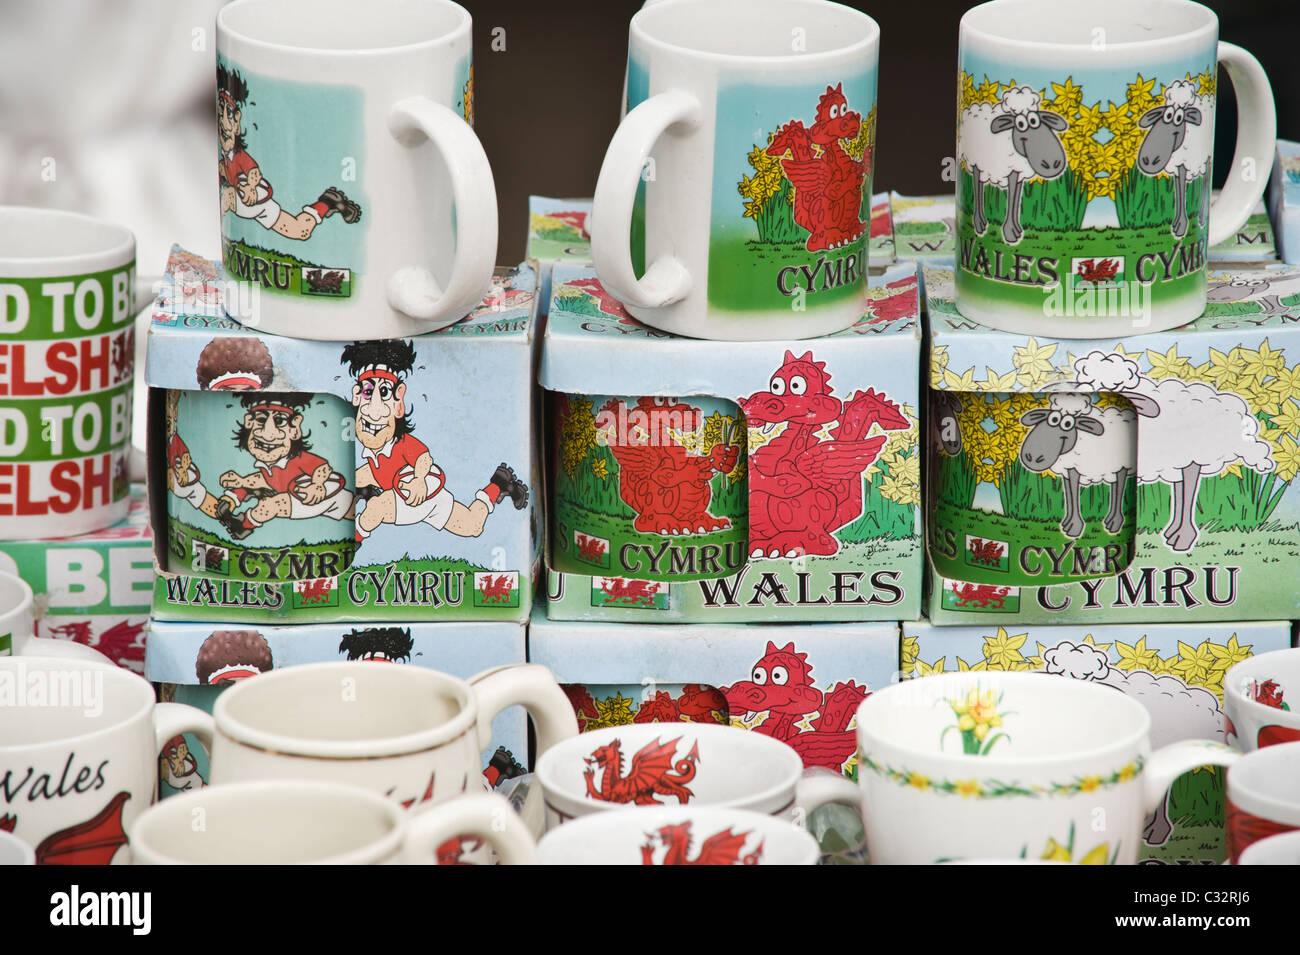 Novelty WALES mugs for sale at National Eisteddfod 2010 Ebbw Vale Blaenau Gwent South Wales UK - Stock Image